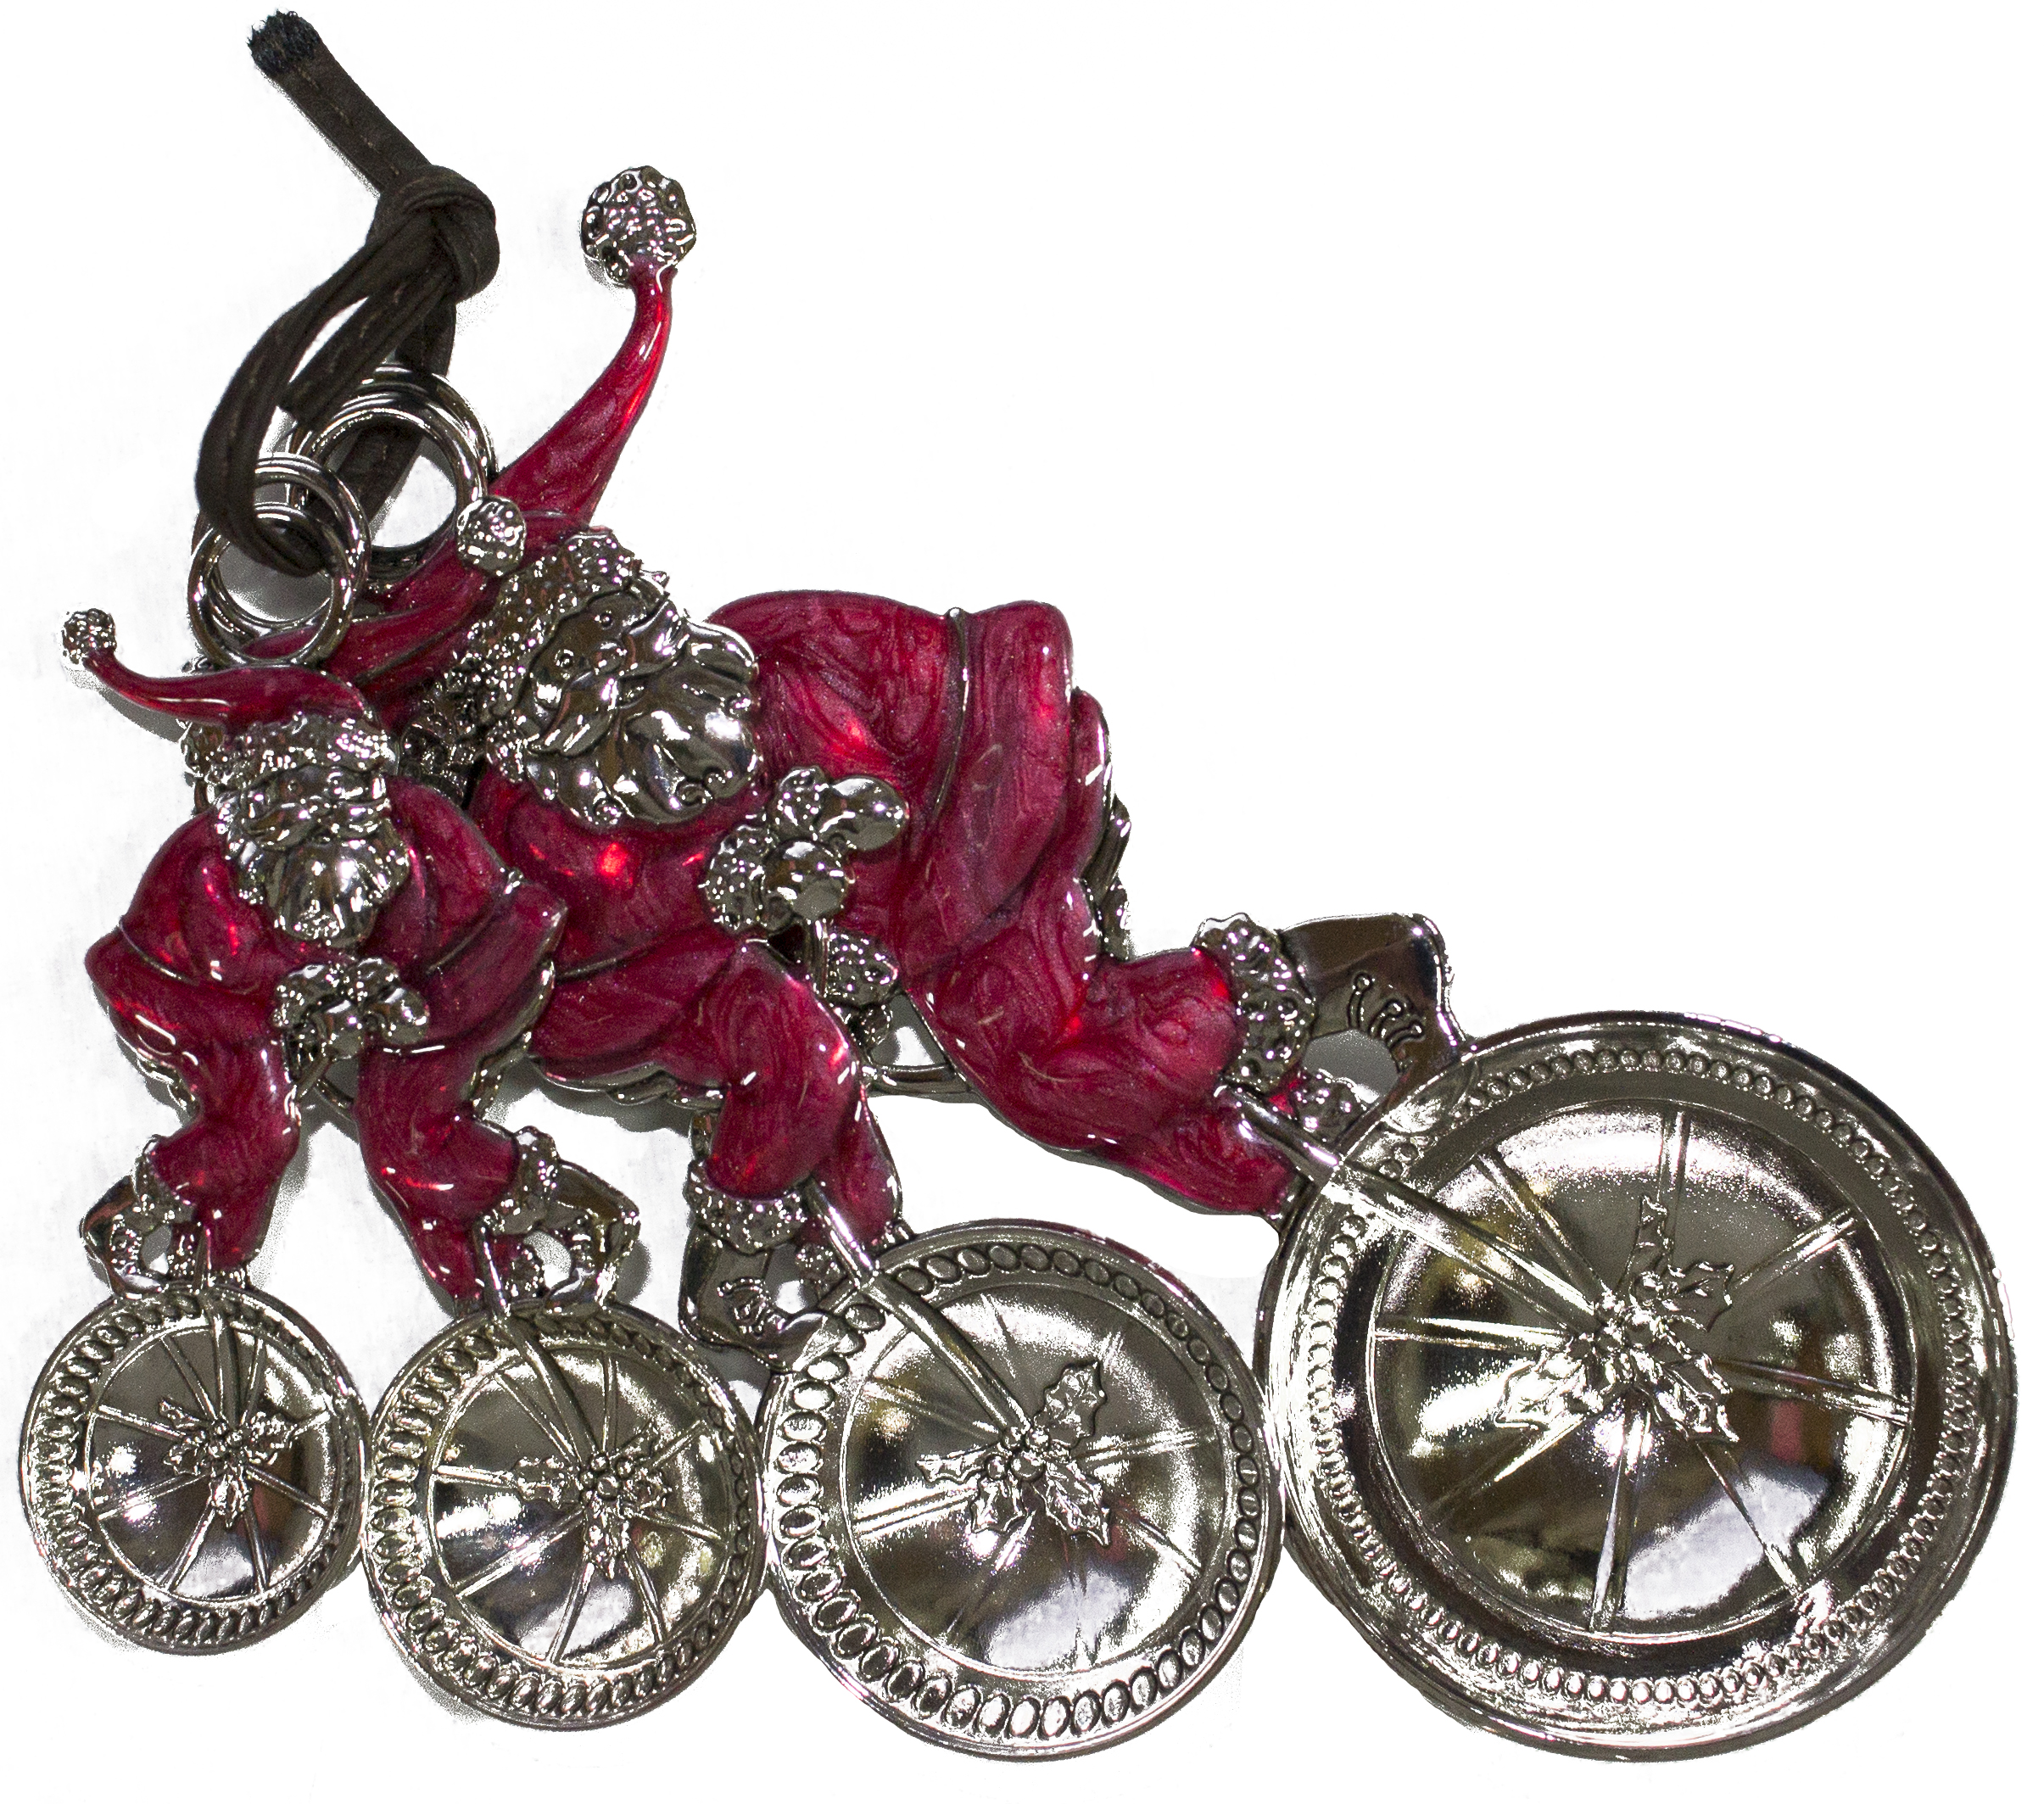 Attractive High Quality Santa's Ride Zinc 4 Piece Measuring Spoon Set by Gnz